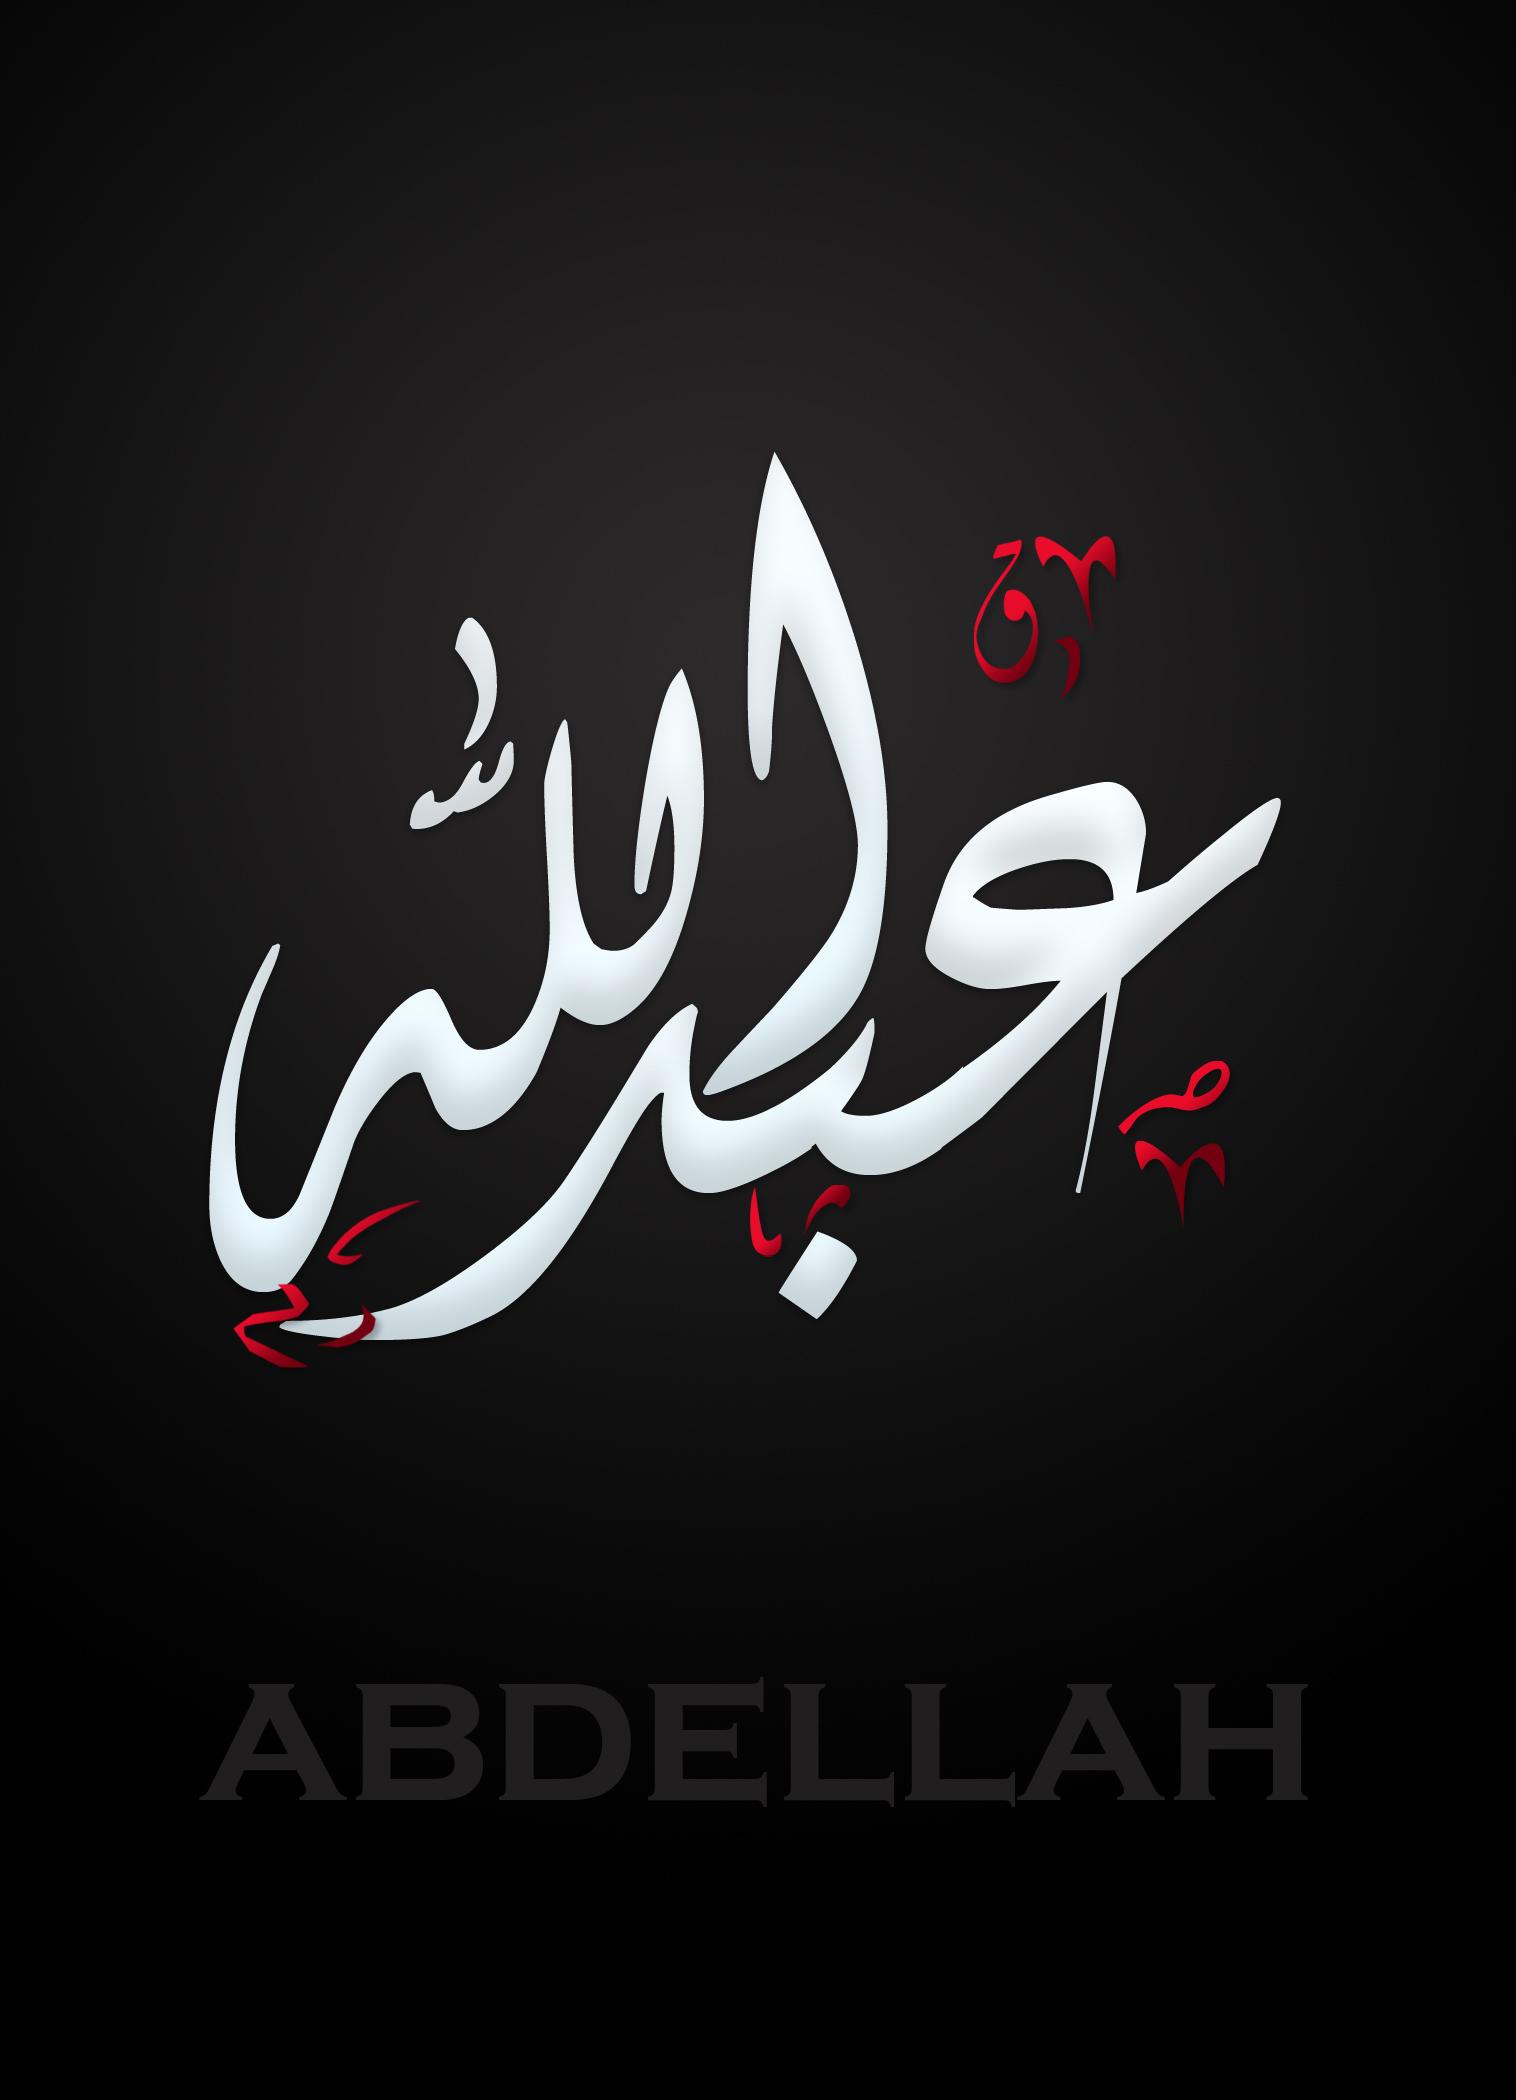 صور صور اسم عبدالله , صور لاحلى اسم